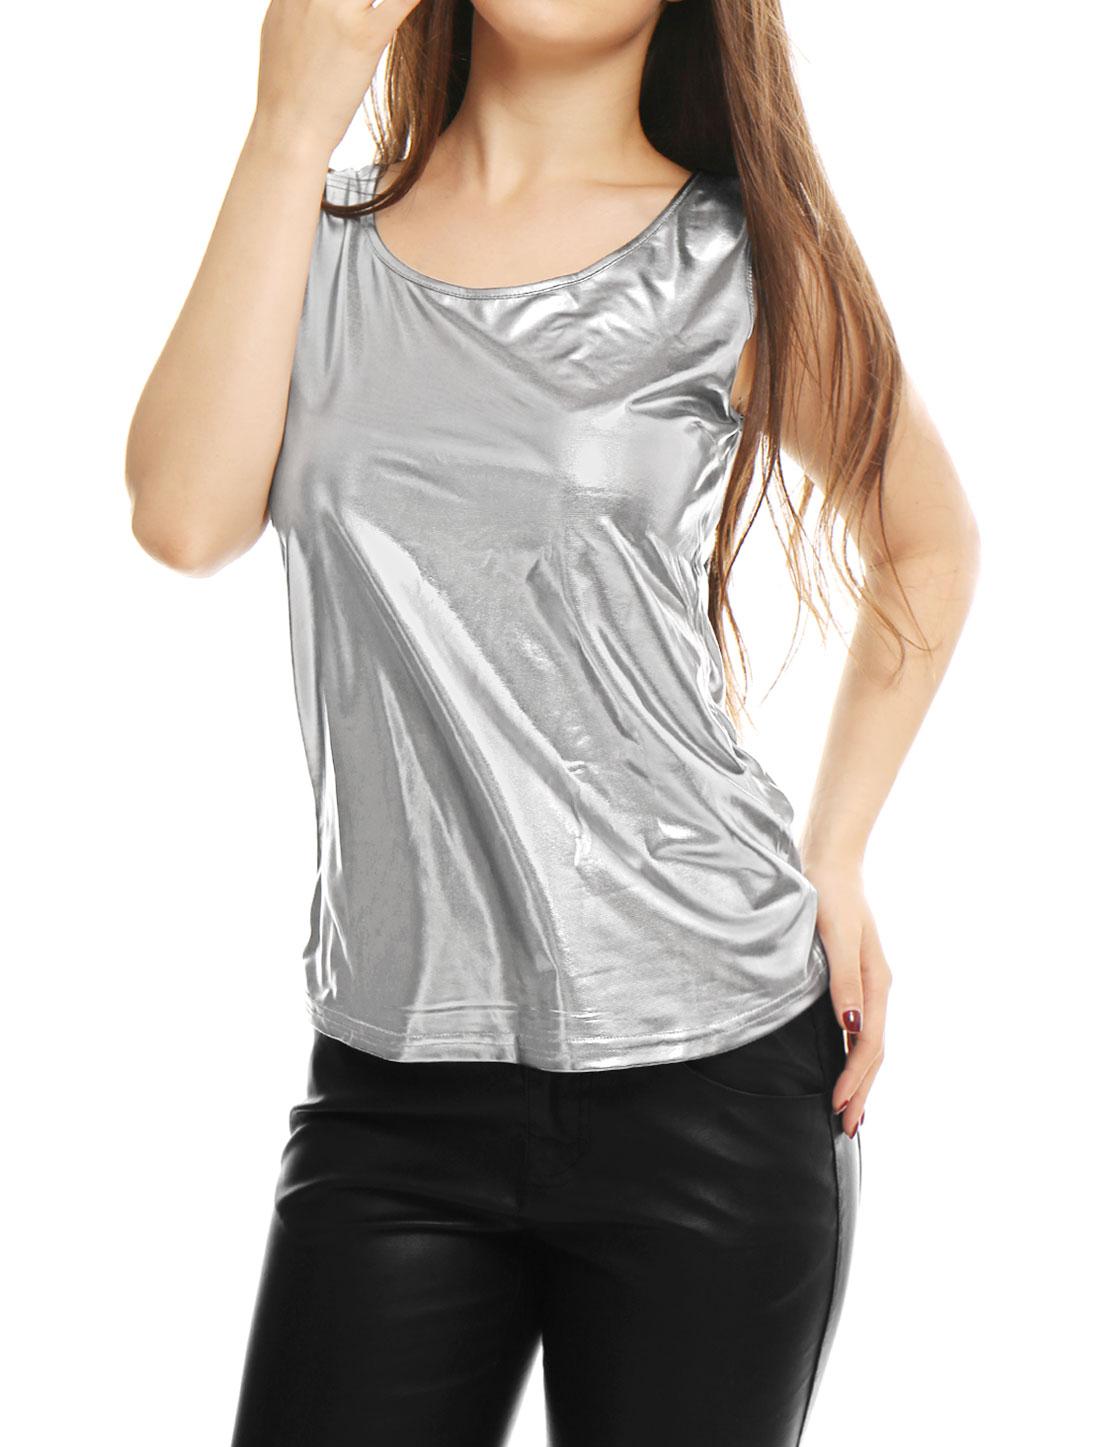 Ladies Sleeveless U Neck Slim Fit Metallic Tank Top Silver L